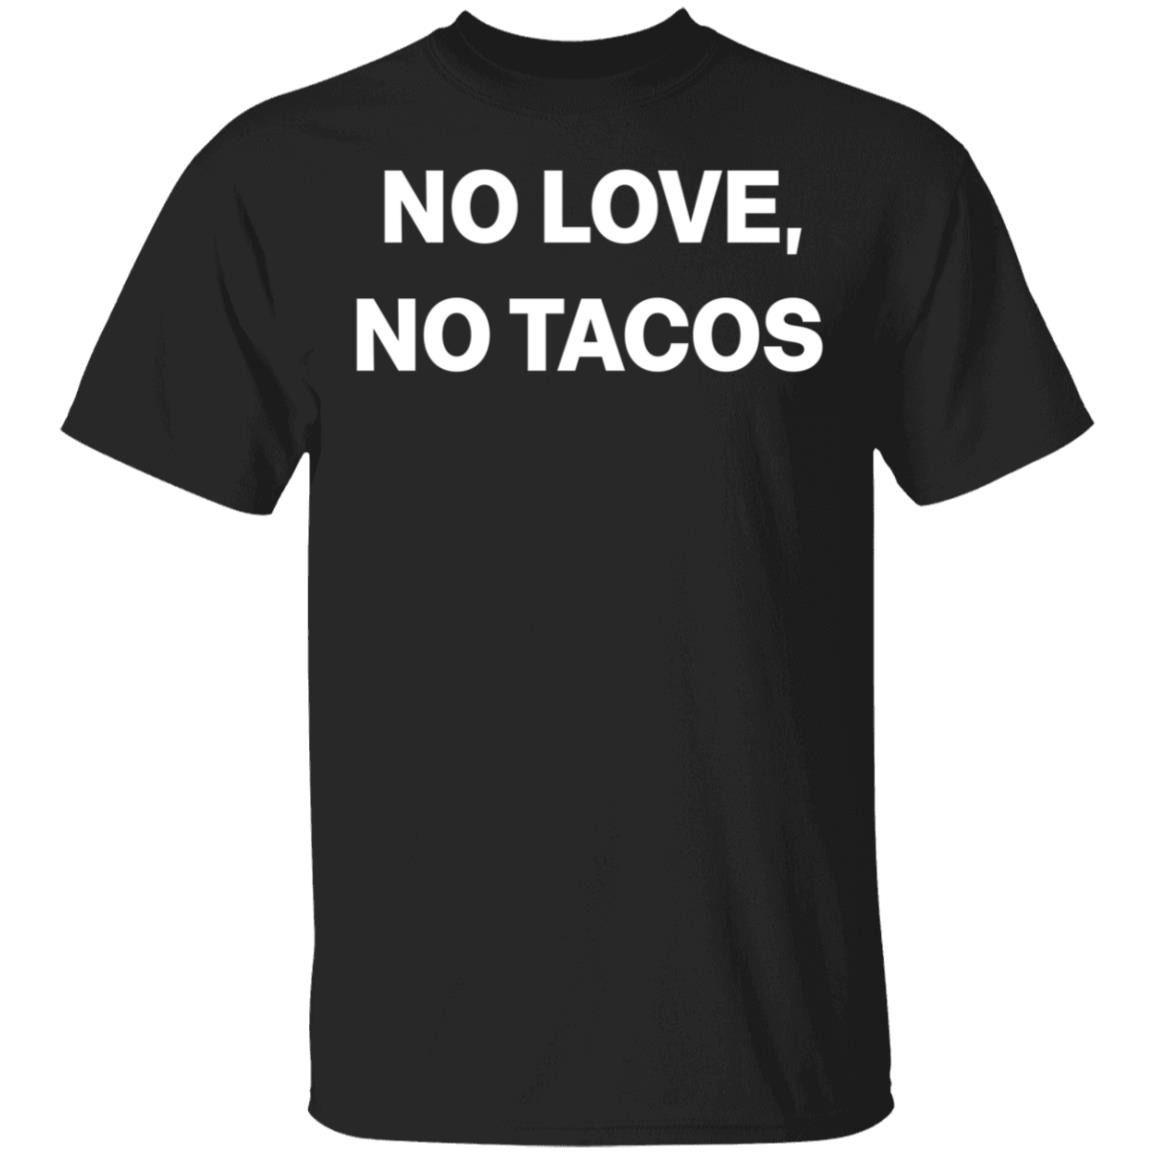 No LOVE No TACOS Shirt T-Shirt